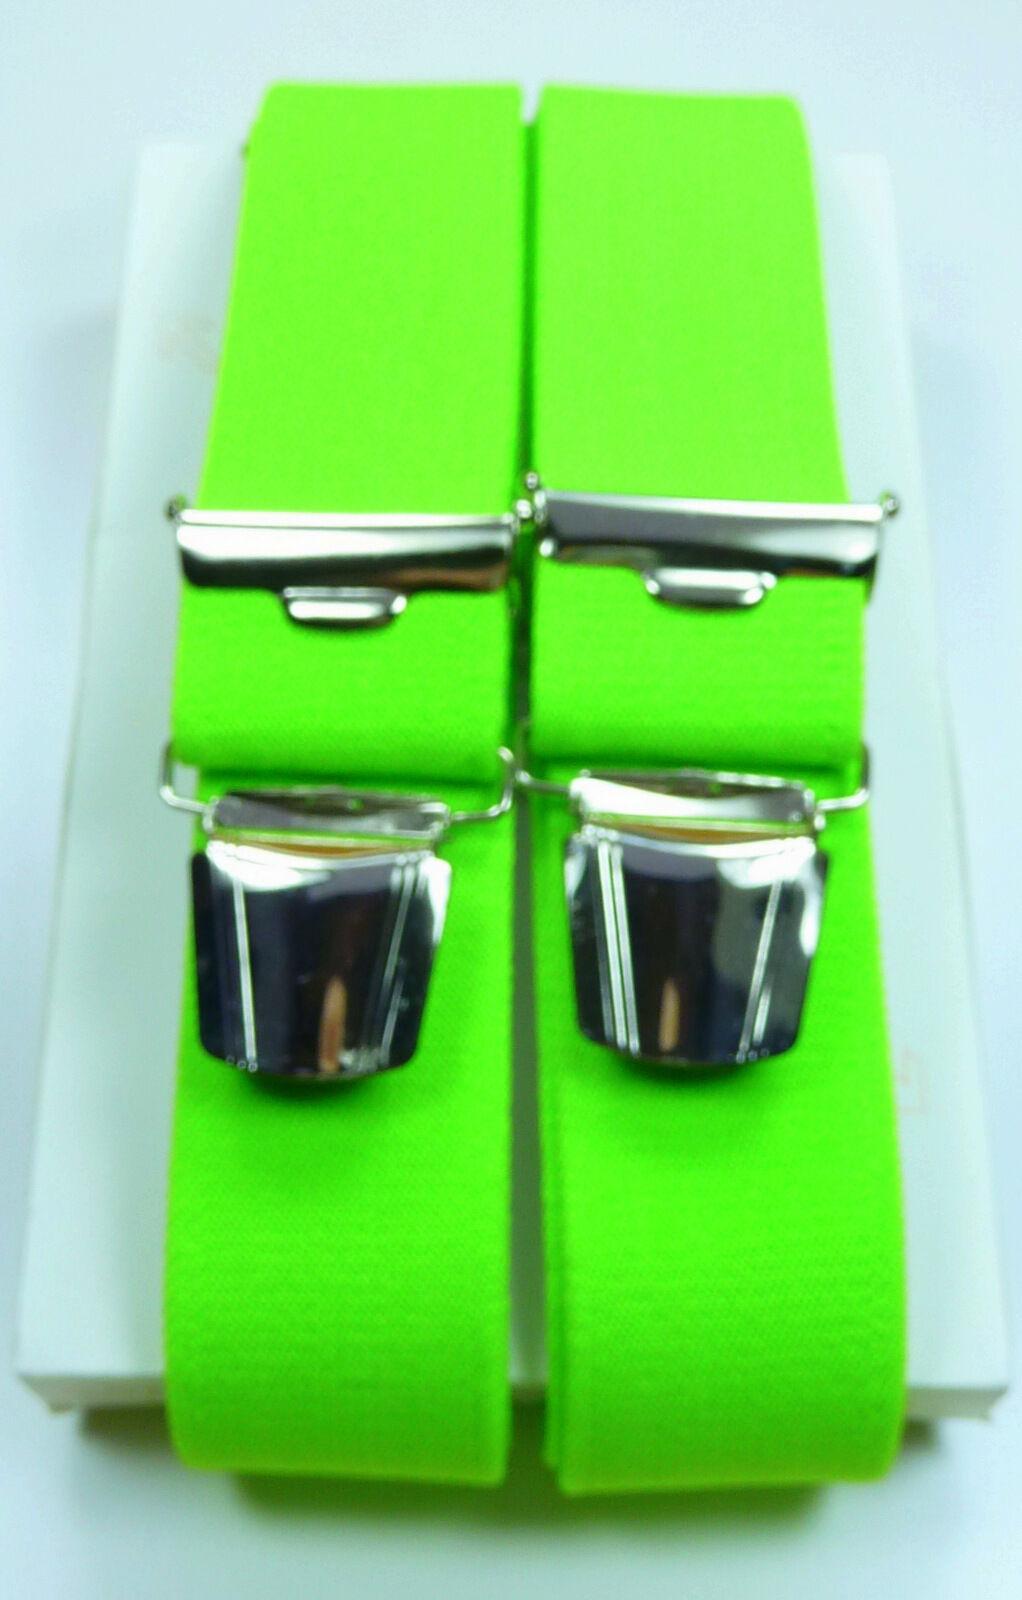 robuste Hosenträger,neon-grün starke,stabile solide Klips,35mm breit,120cm lang